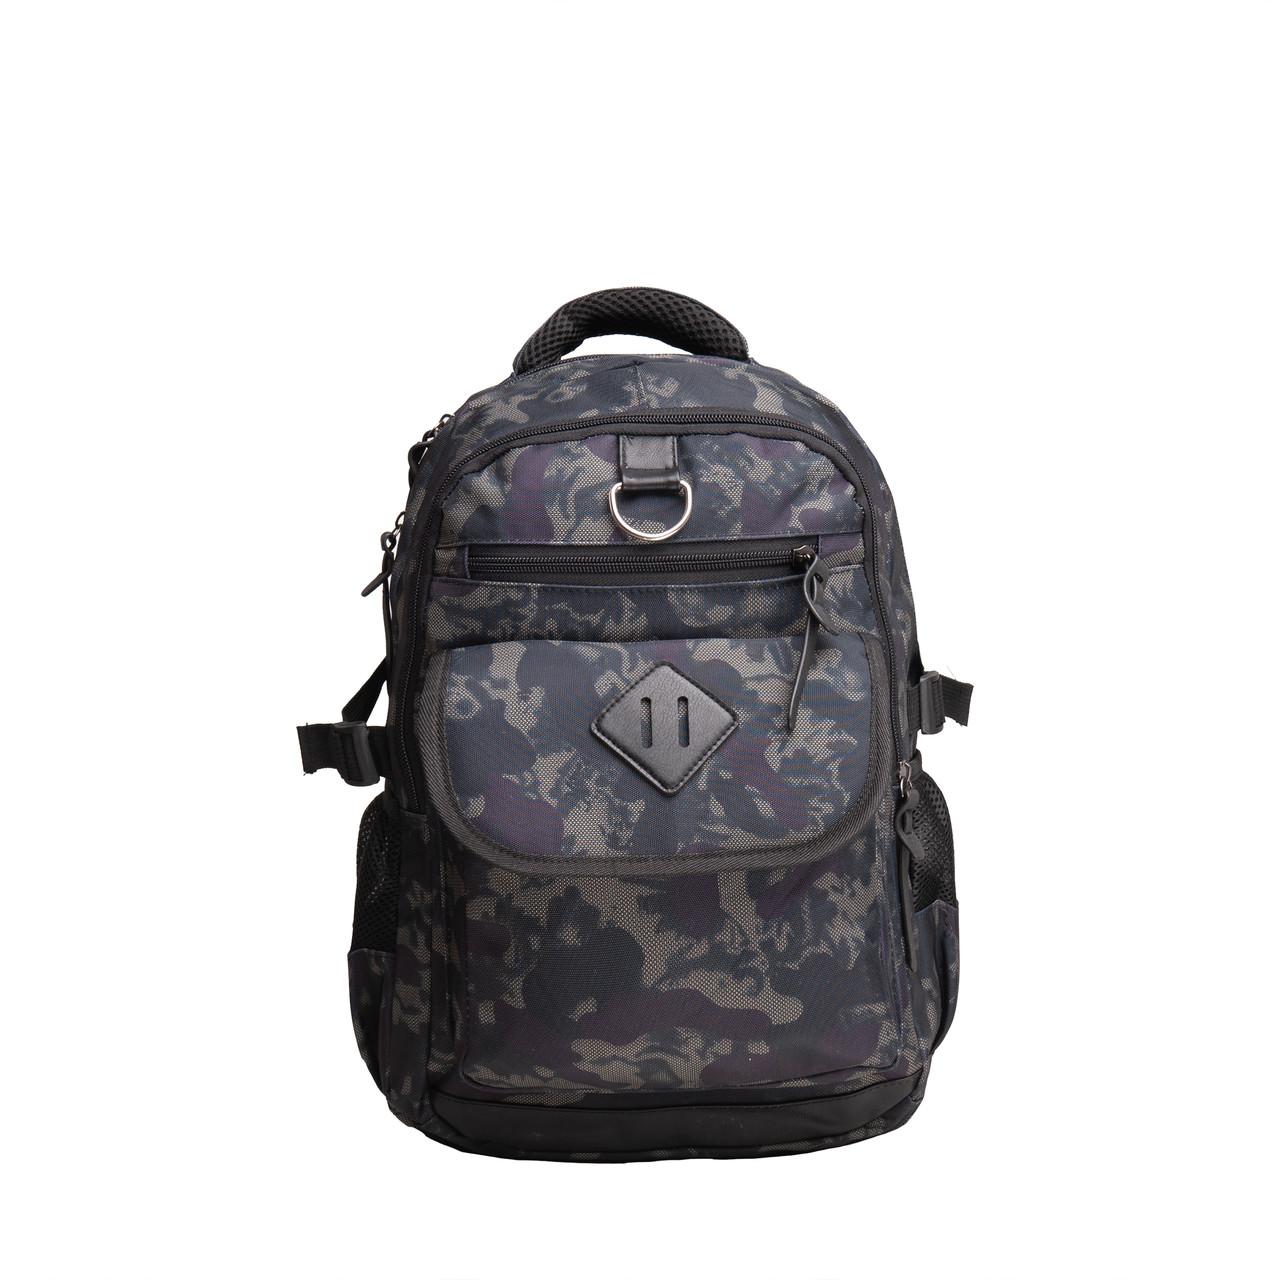 Рюкзак городской BagHouse 49х29х20 сине-серый ткань нейлон  кс3219син сер